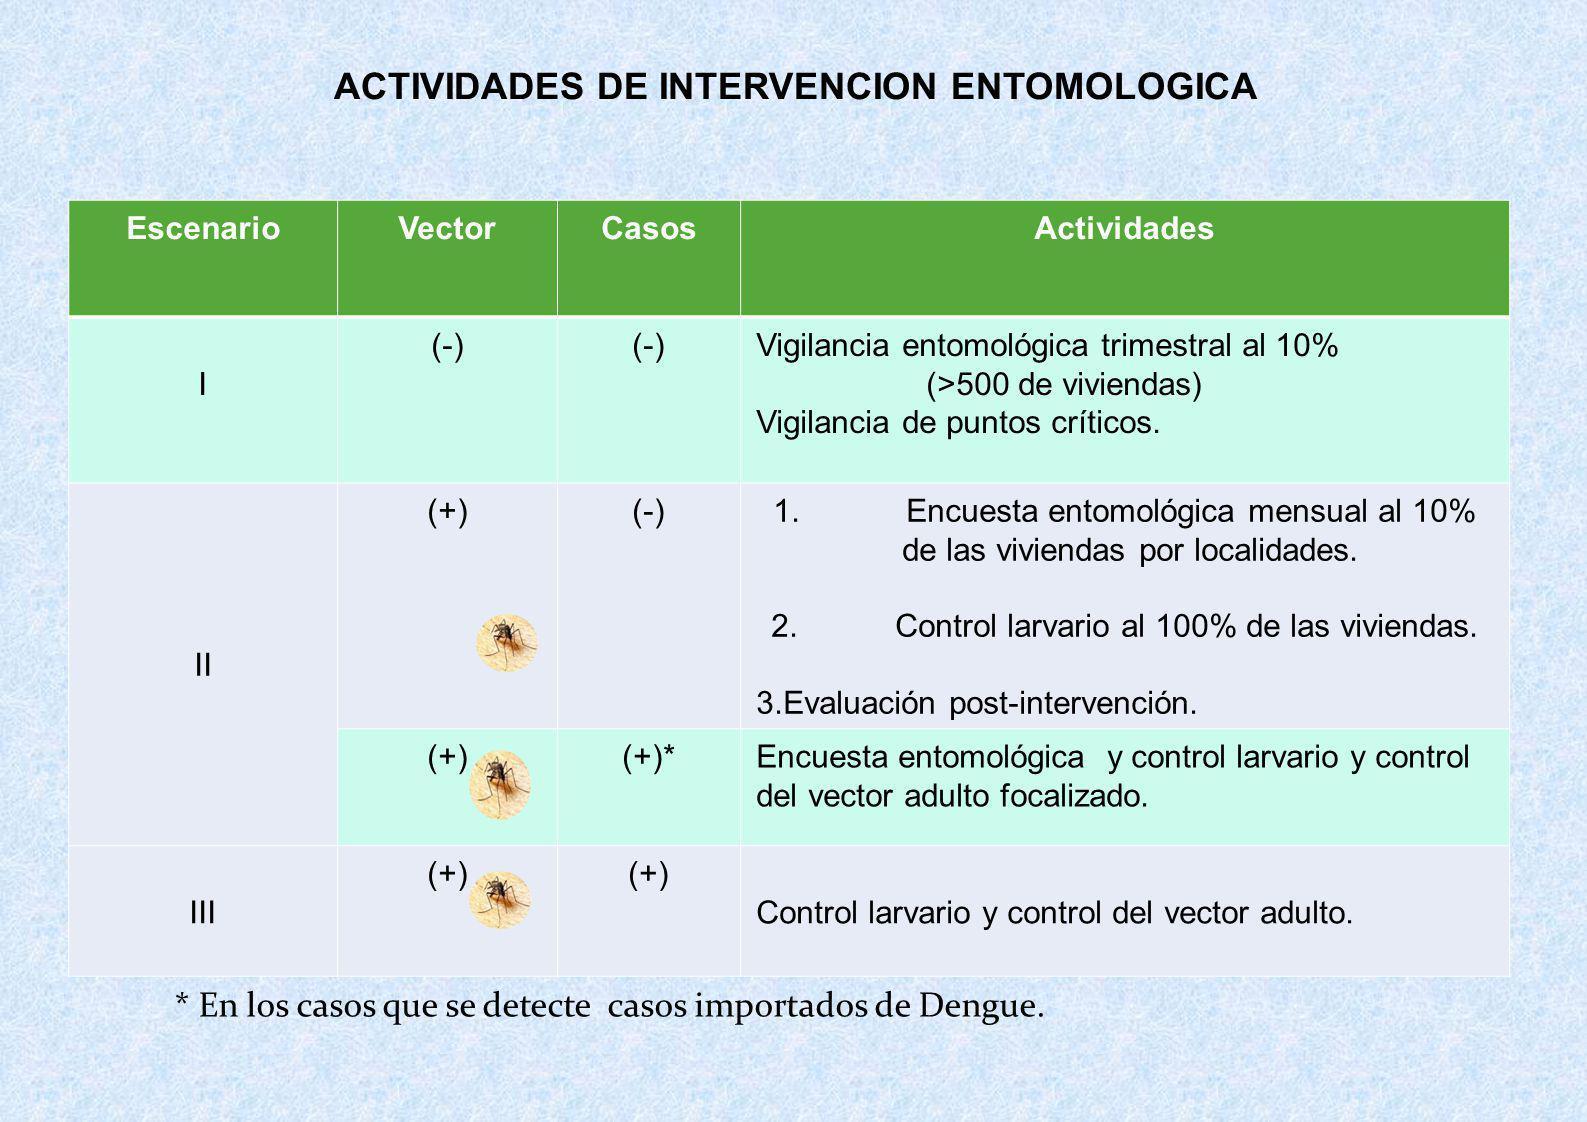 ACTIVIDADES DE INTERVENCION ENTOMOLOGICA